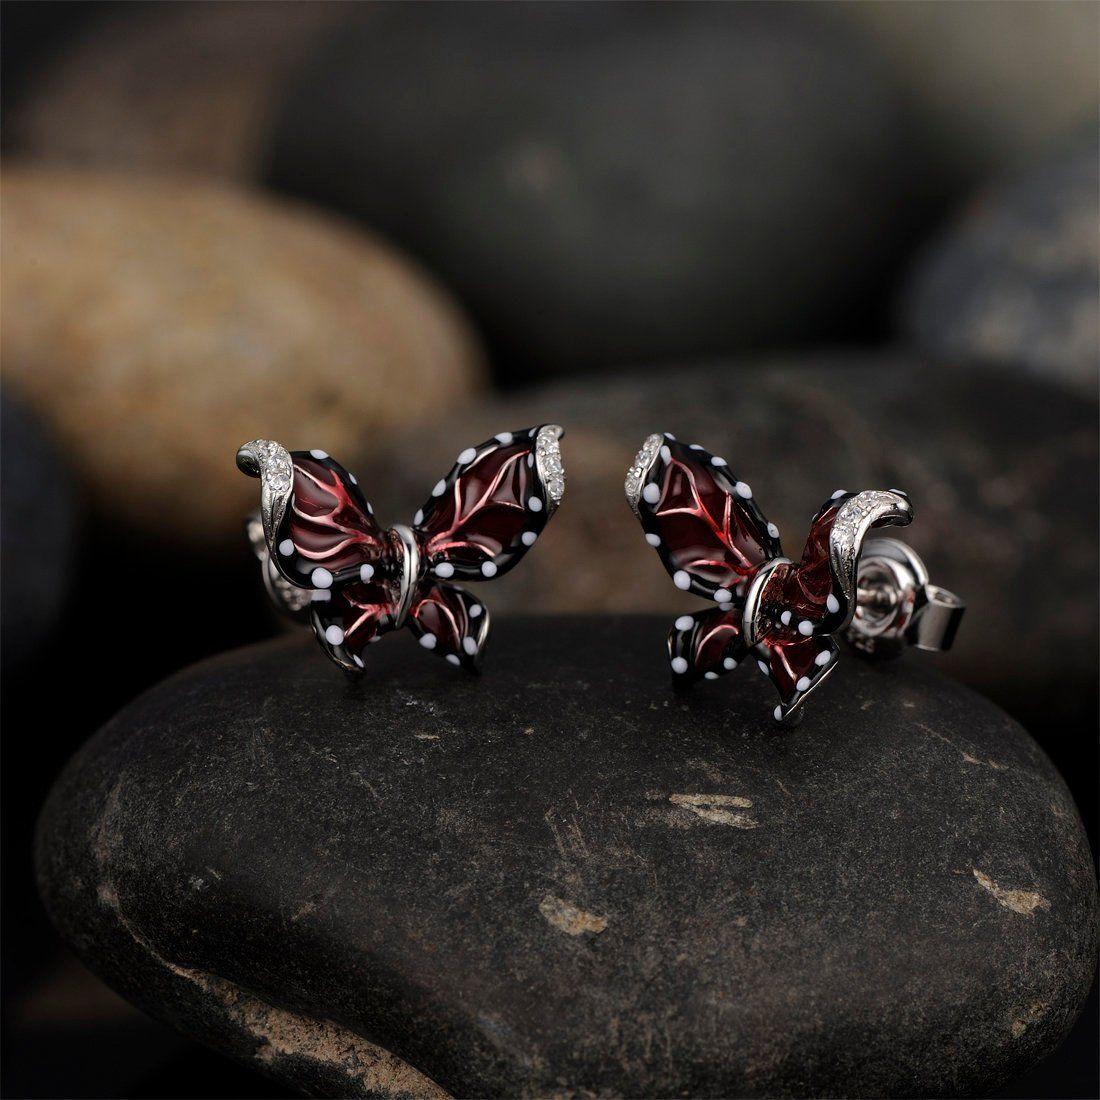 925 Sterling Silver Butterfly Ear Studs So Chic Jewels